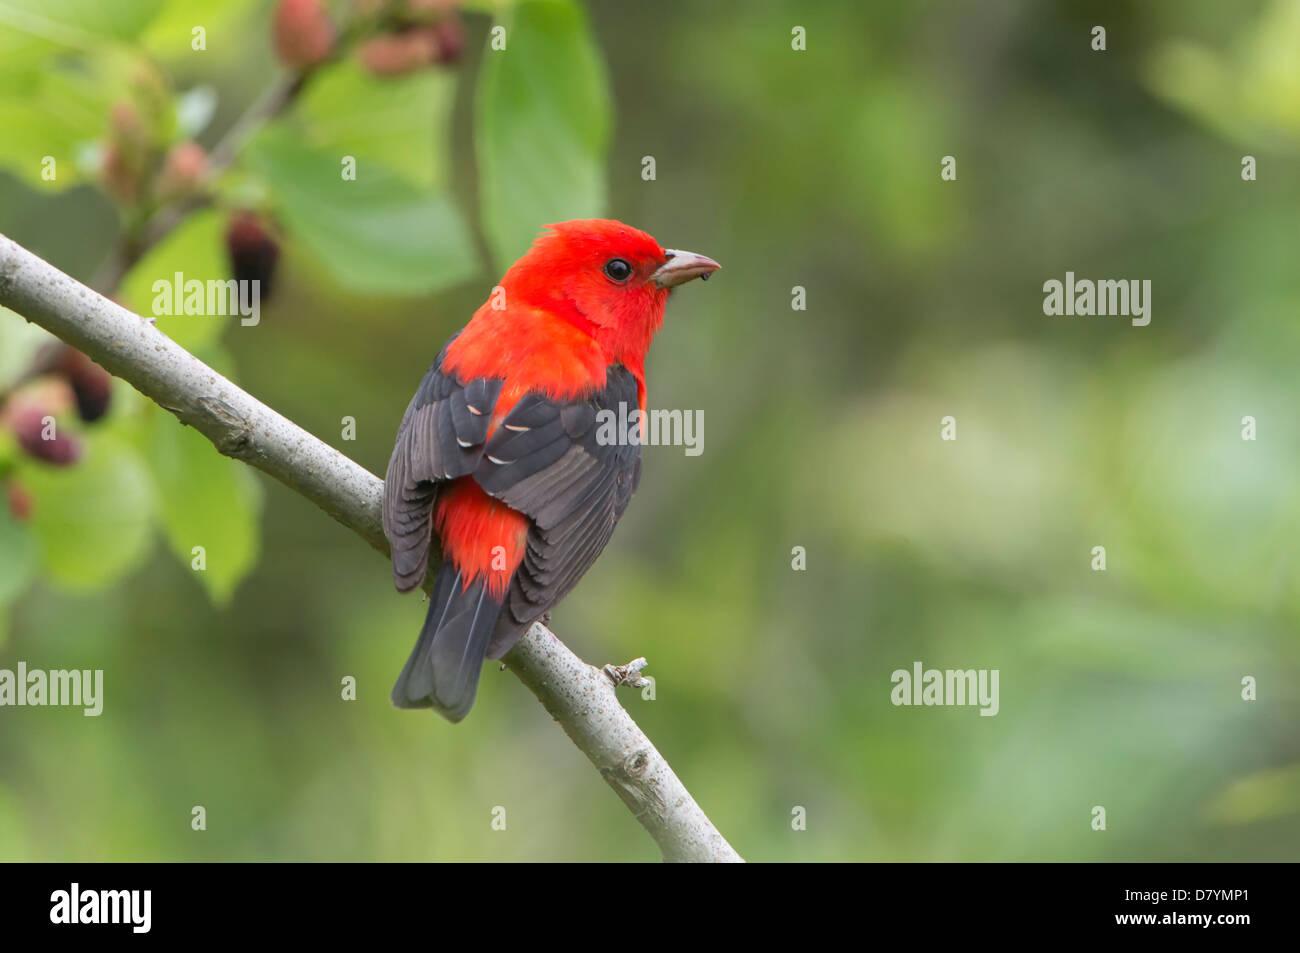 Male Scarlet Tanager (Piranga olivacea), High Island, Texas - Stock Image